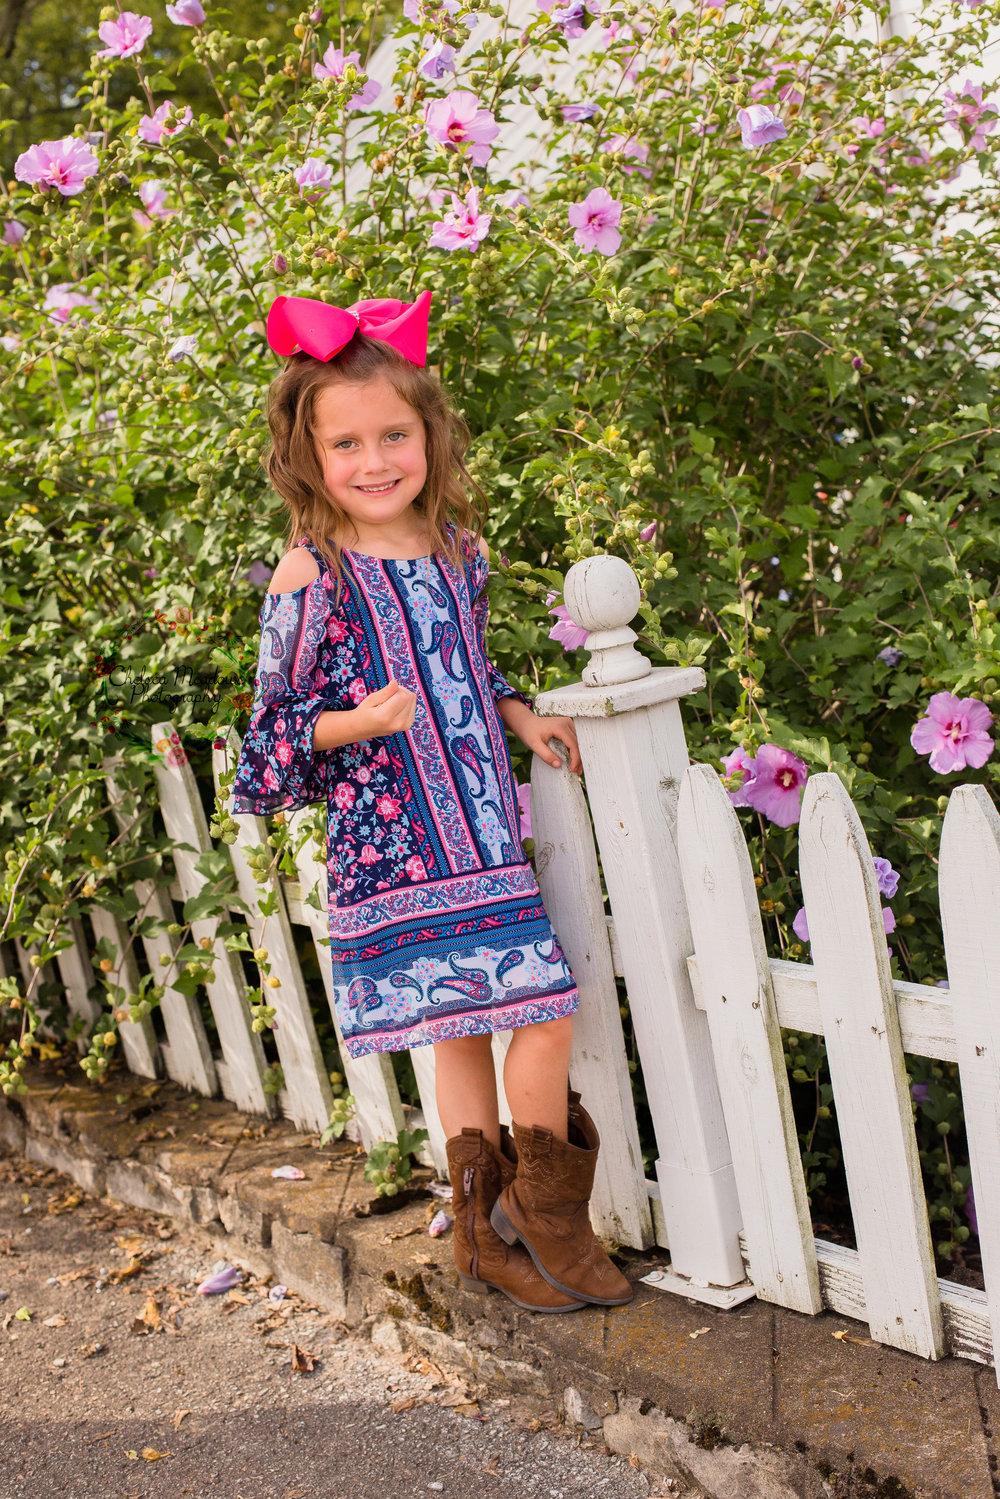 April 6th Birthday - Nashville Family Photographer - Chelsea Meadows Photography (13).jpg